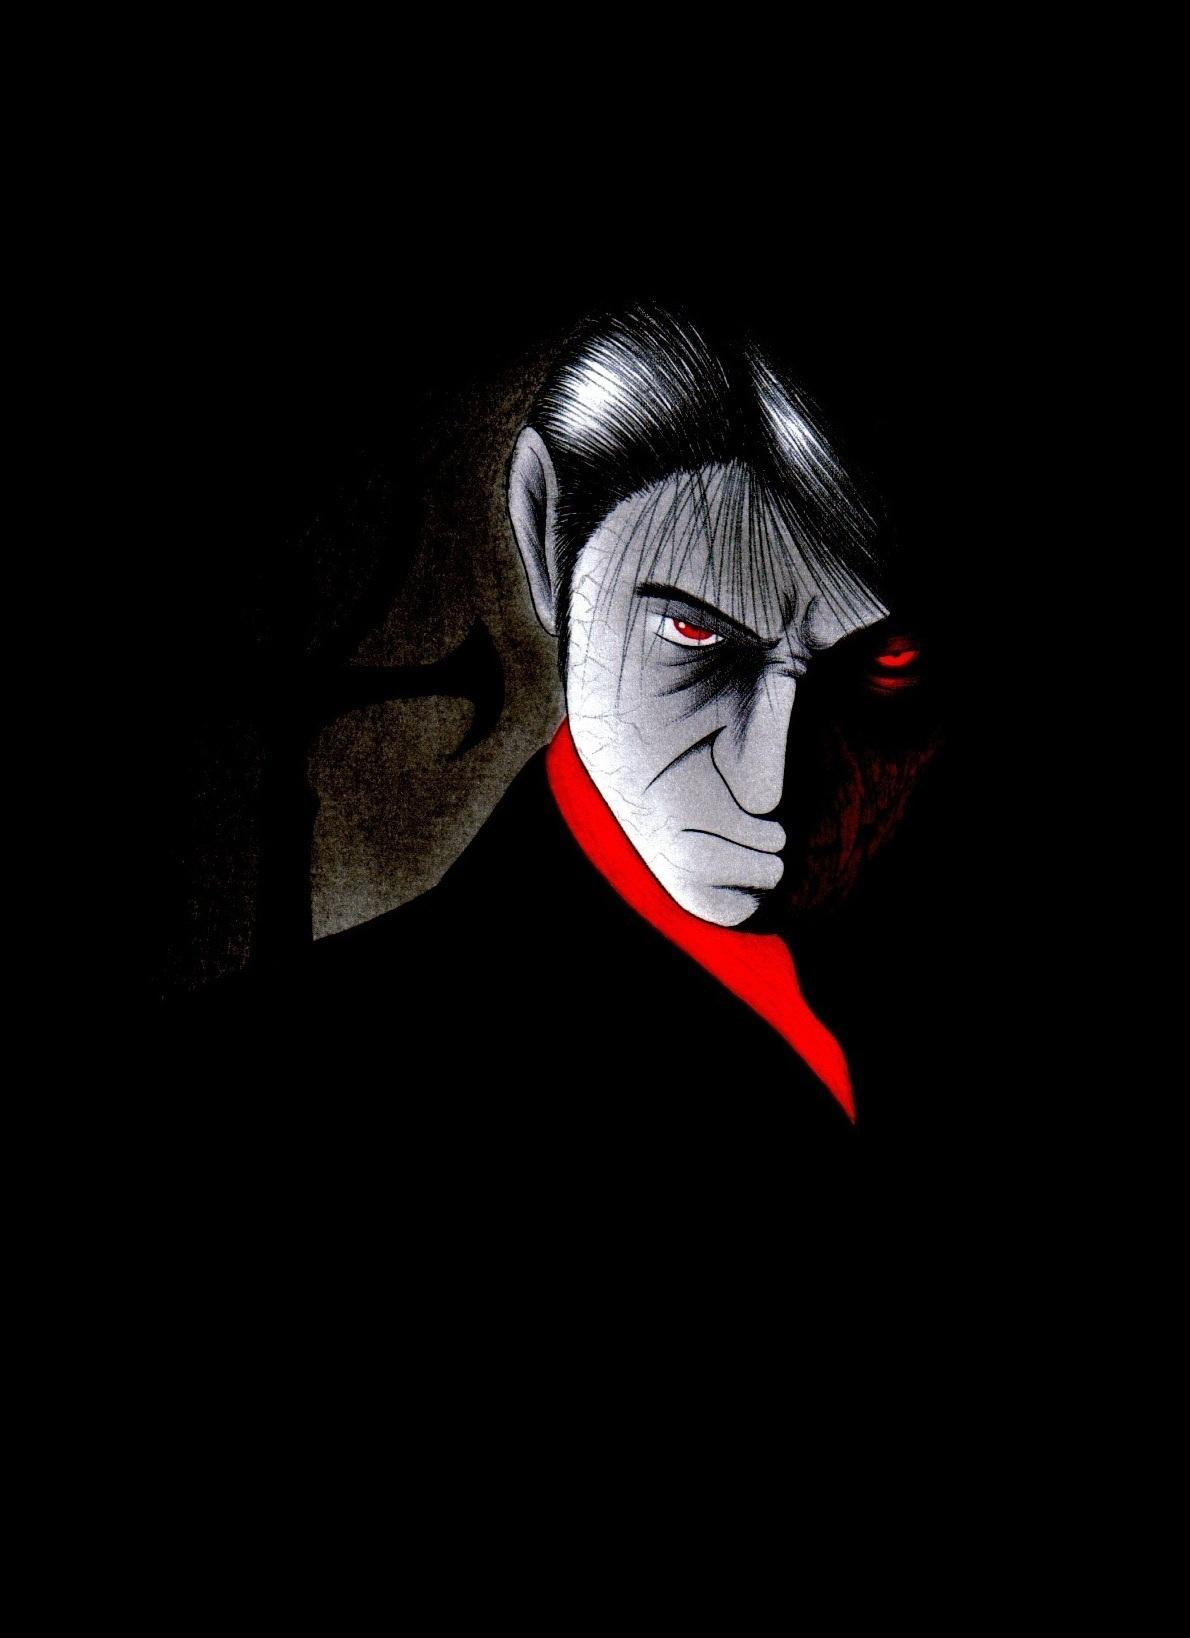 Biblical Cain - First Vampire